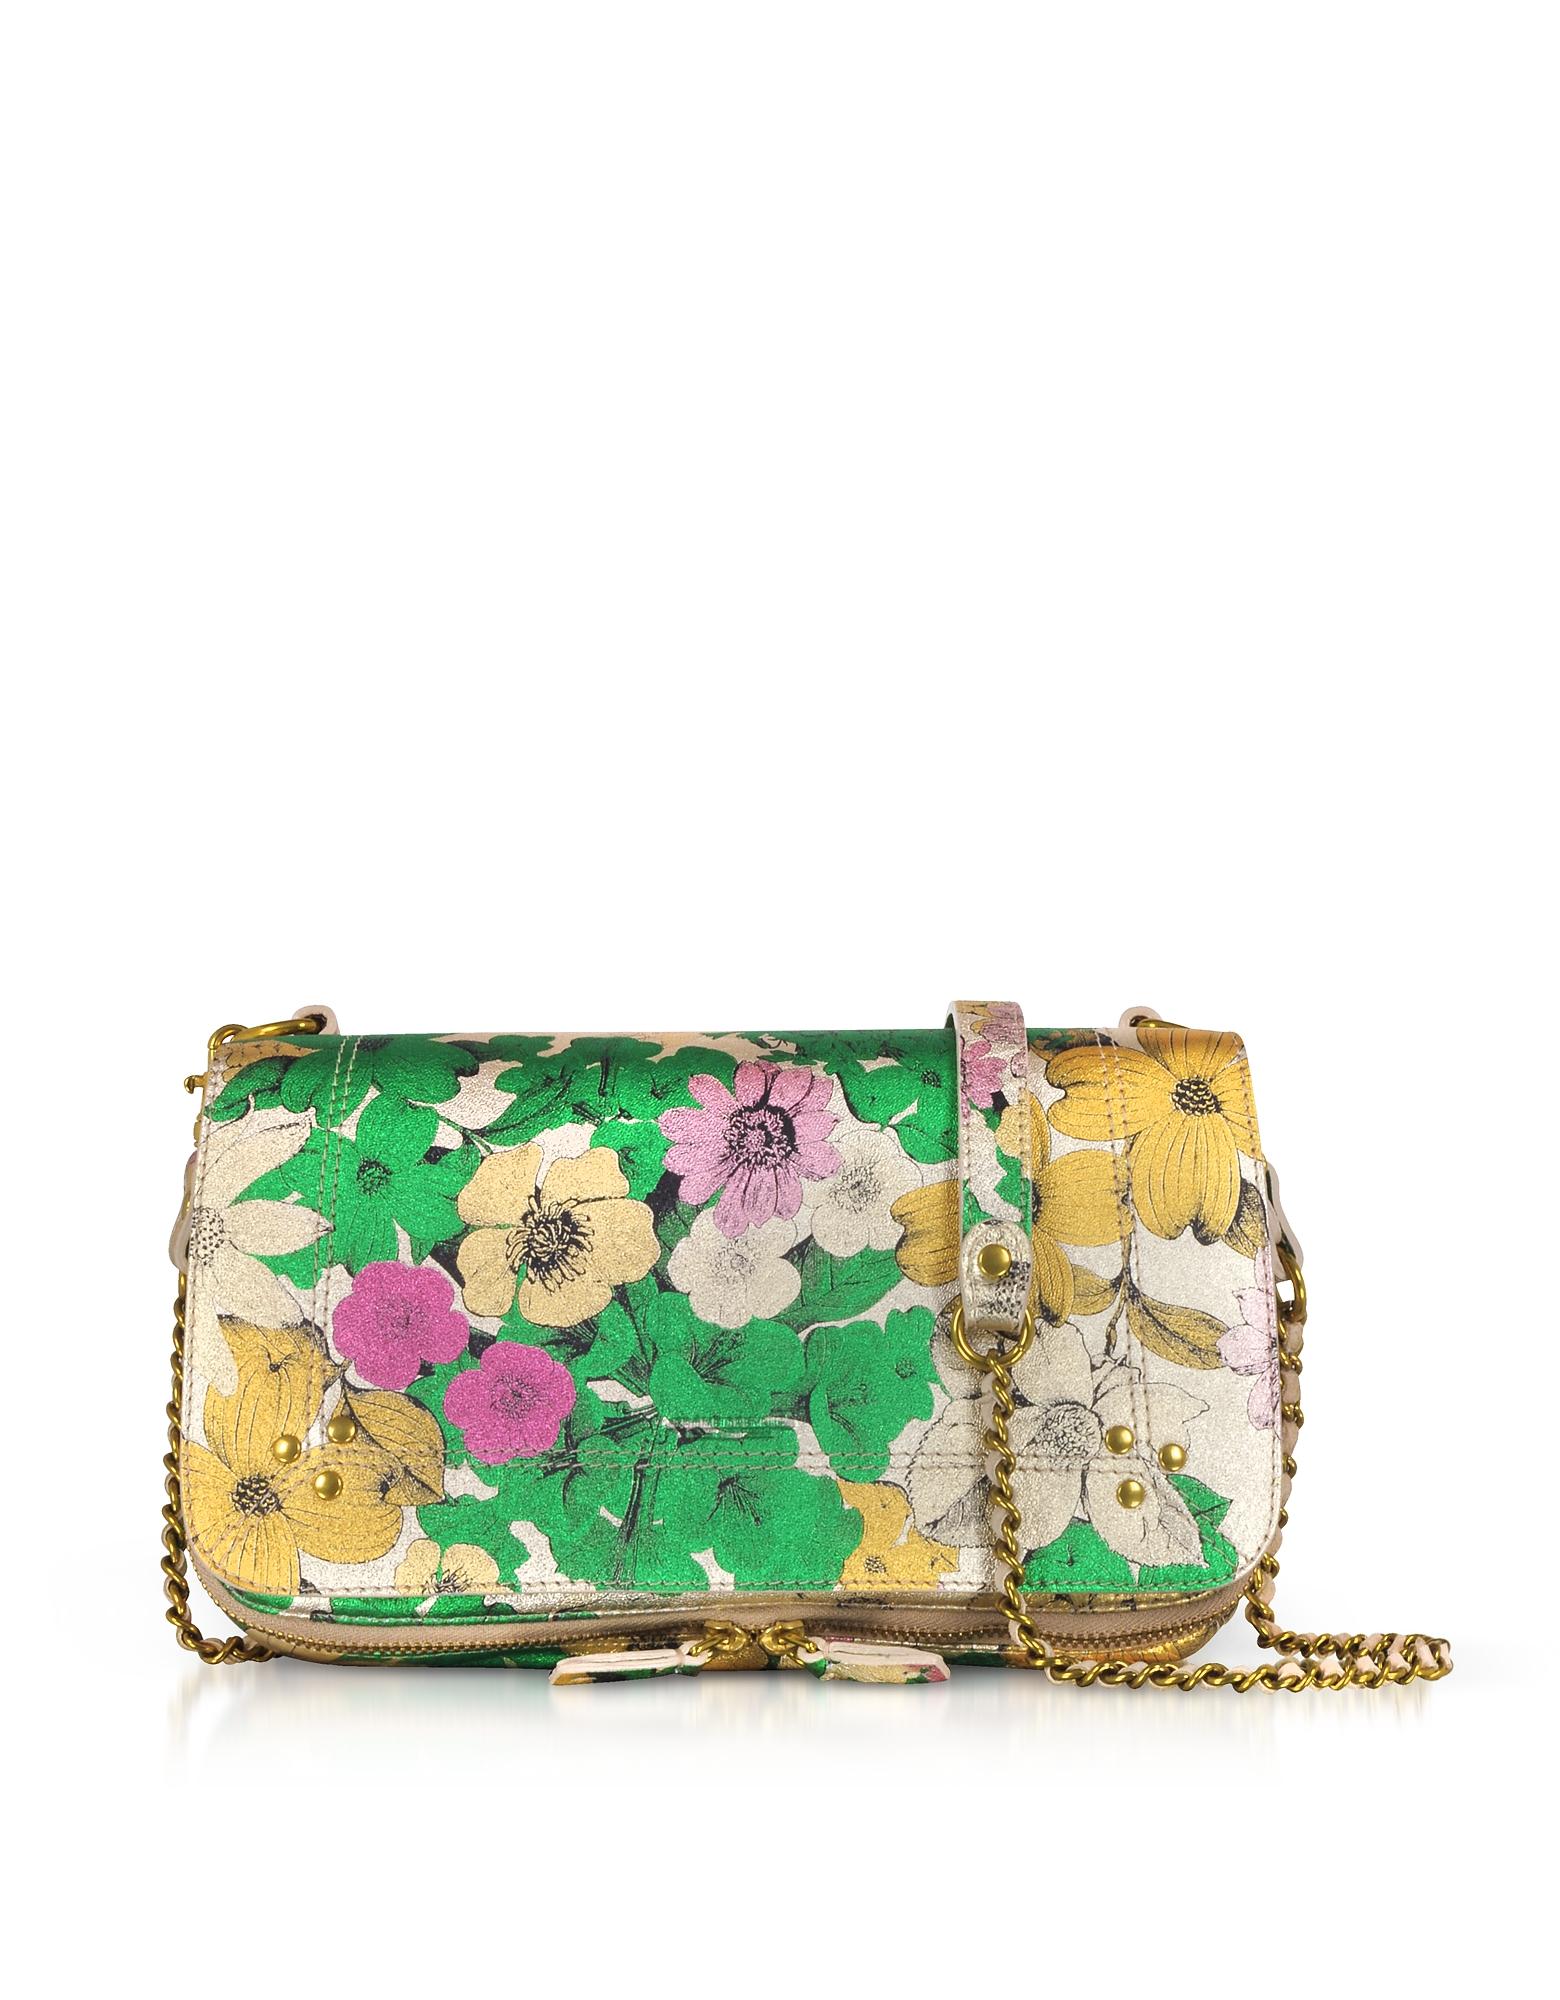 Jerome Dreyfuss Handbags, Bobi Tahiti Lame Shoulder Bag